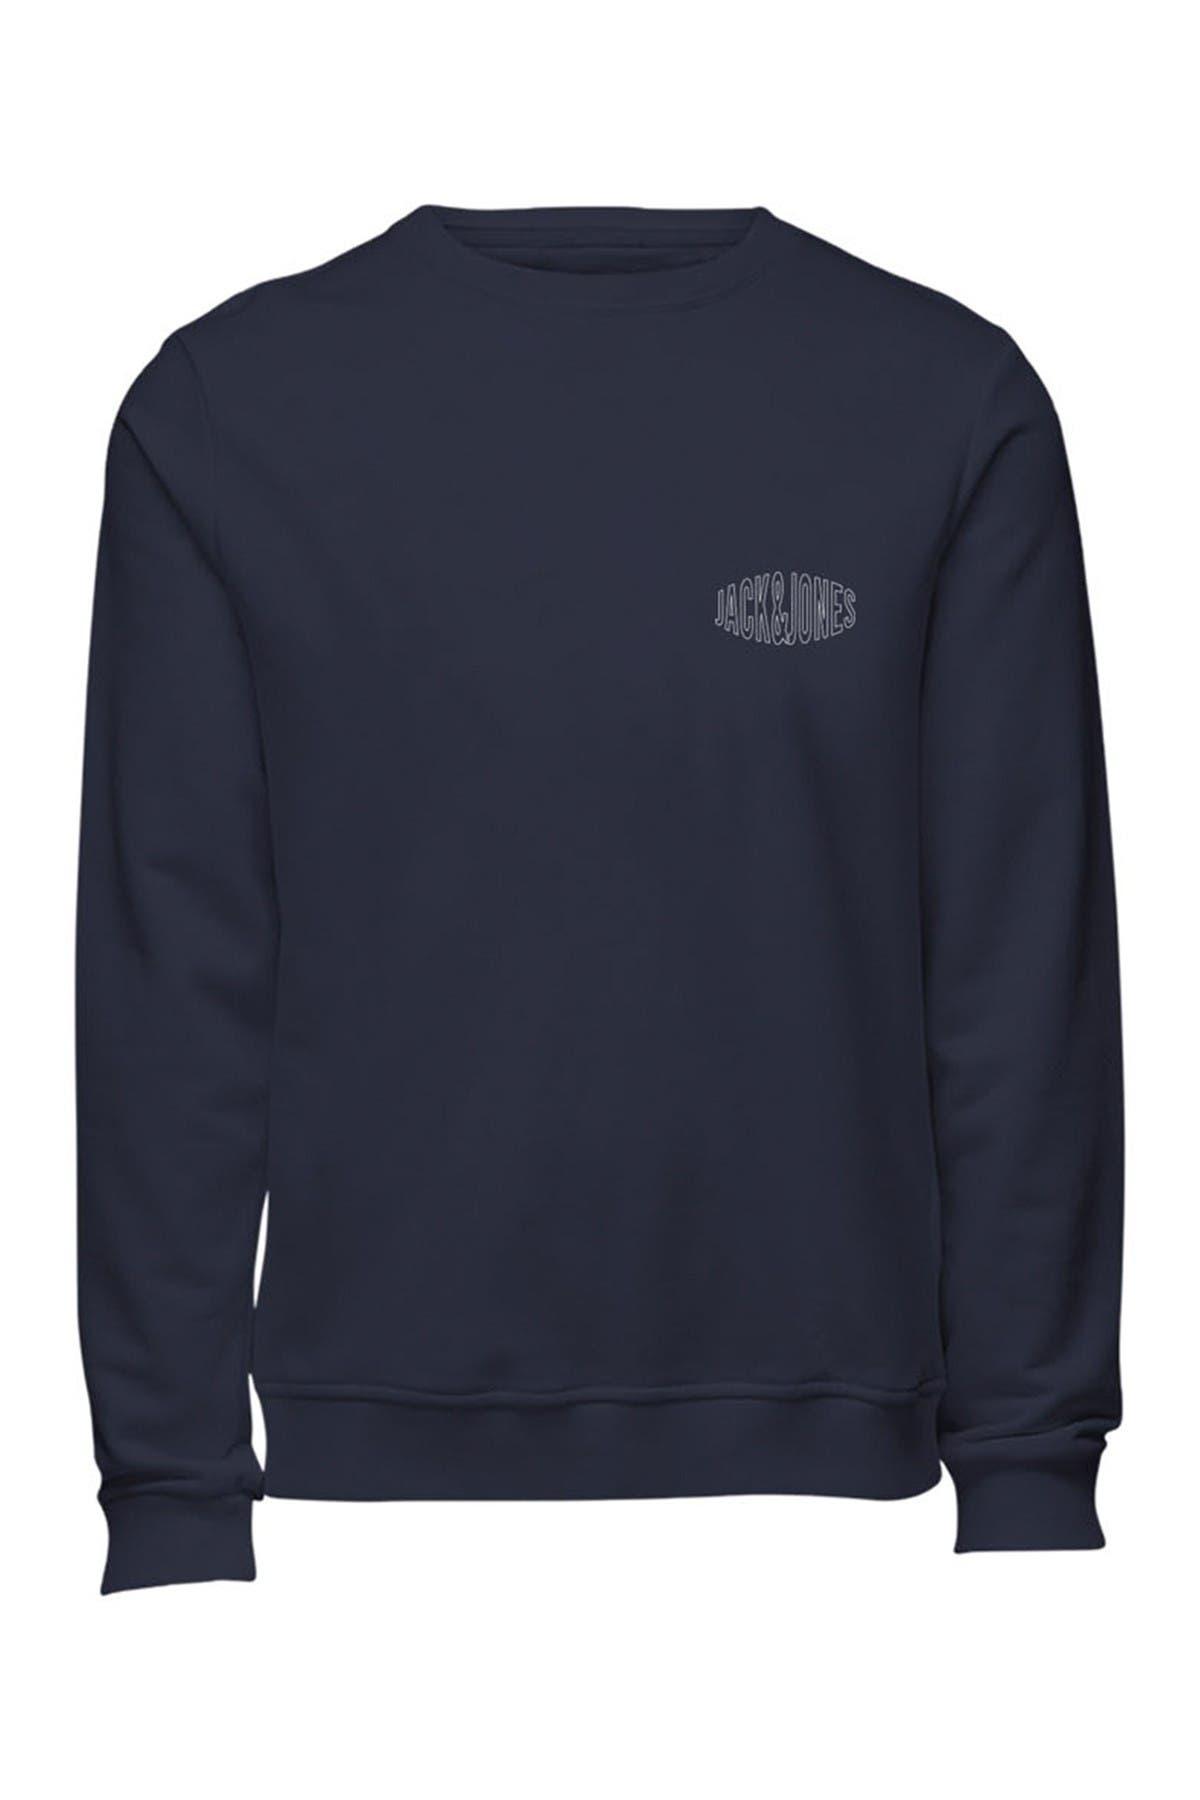 Image of JACK & JONES Preston Crewneck Sweatshirt